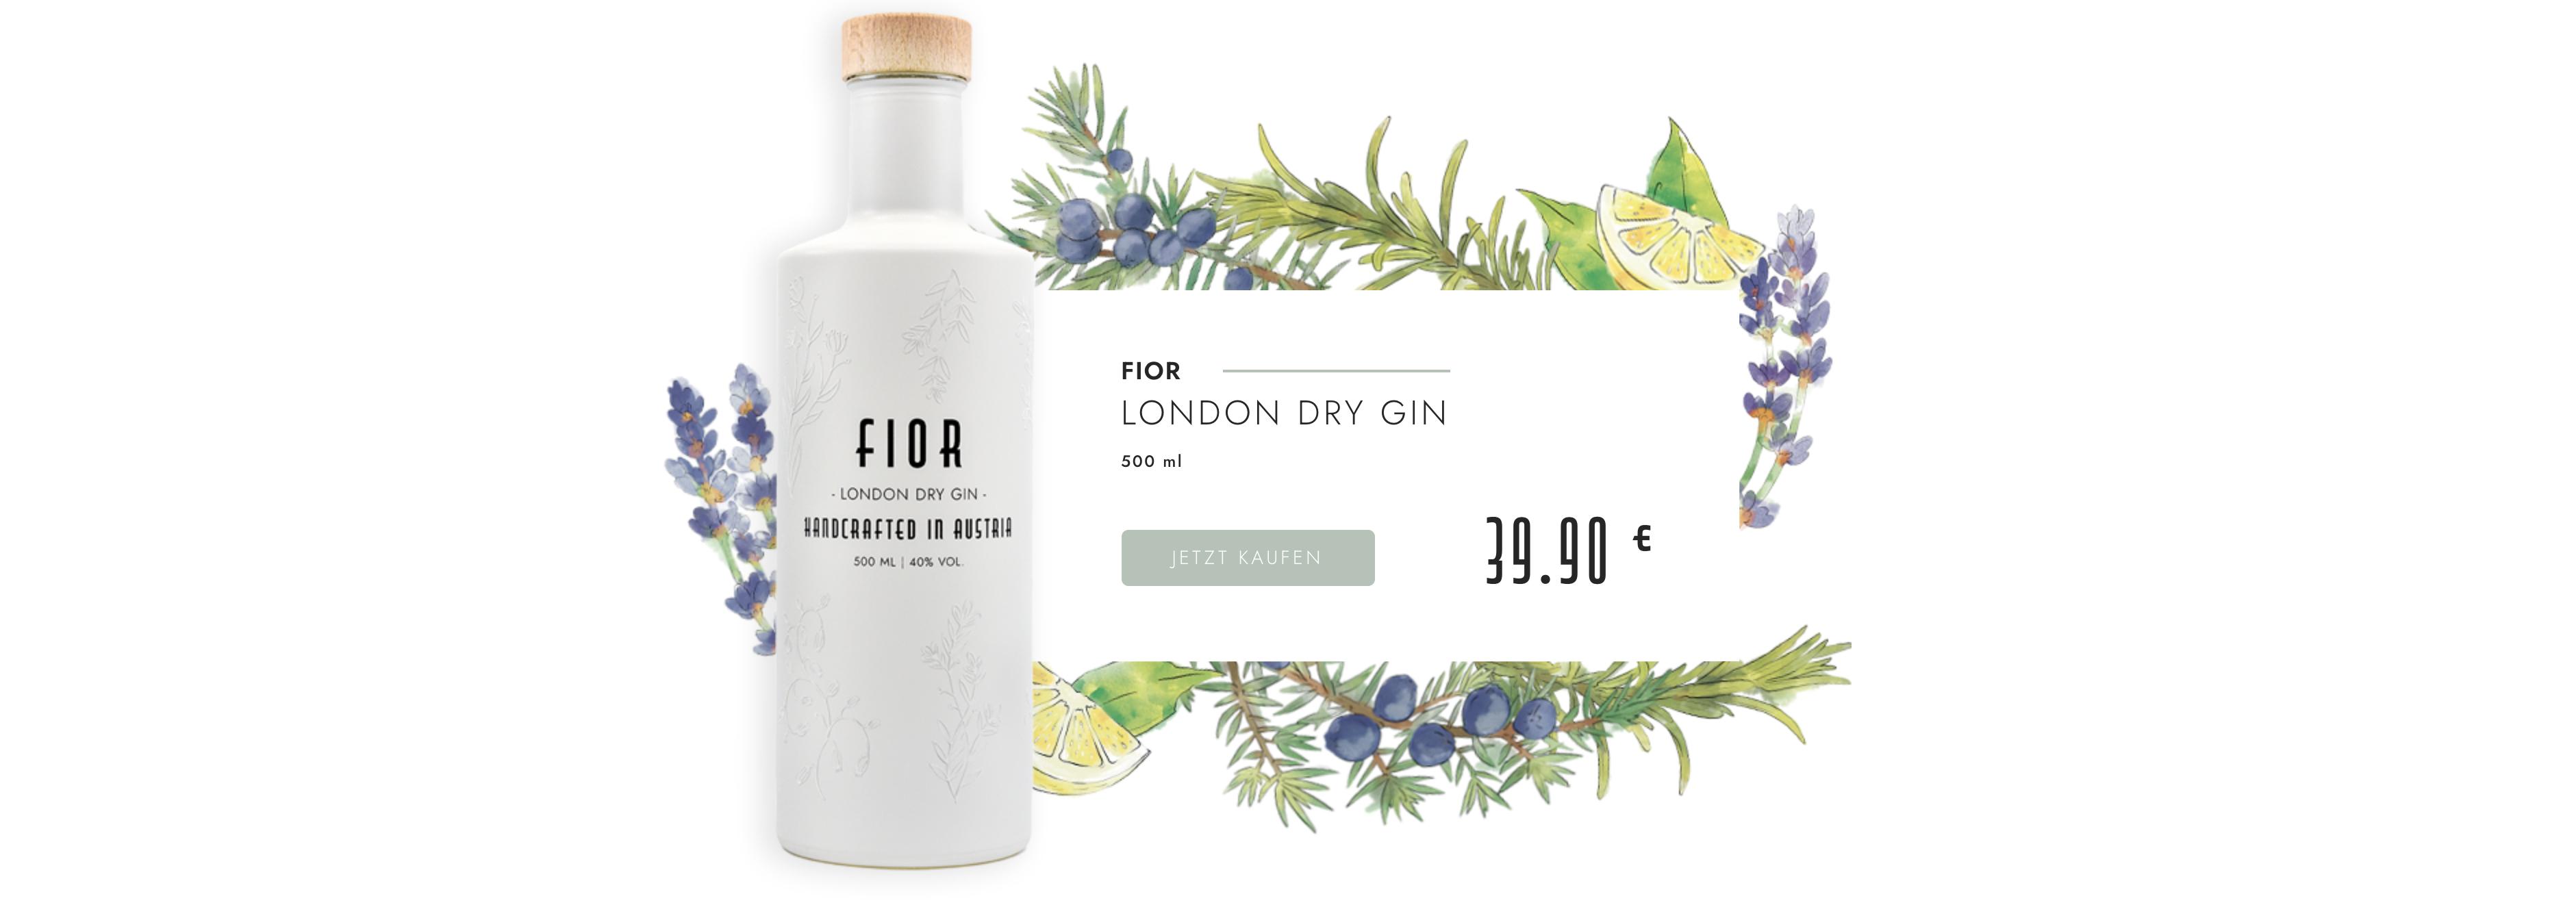 Werbung Fior London Dry Gin